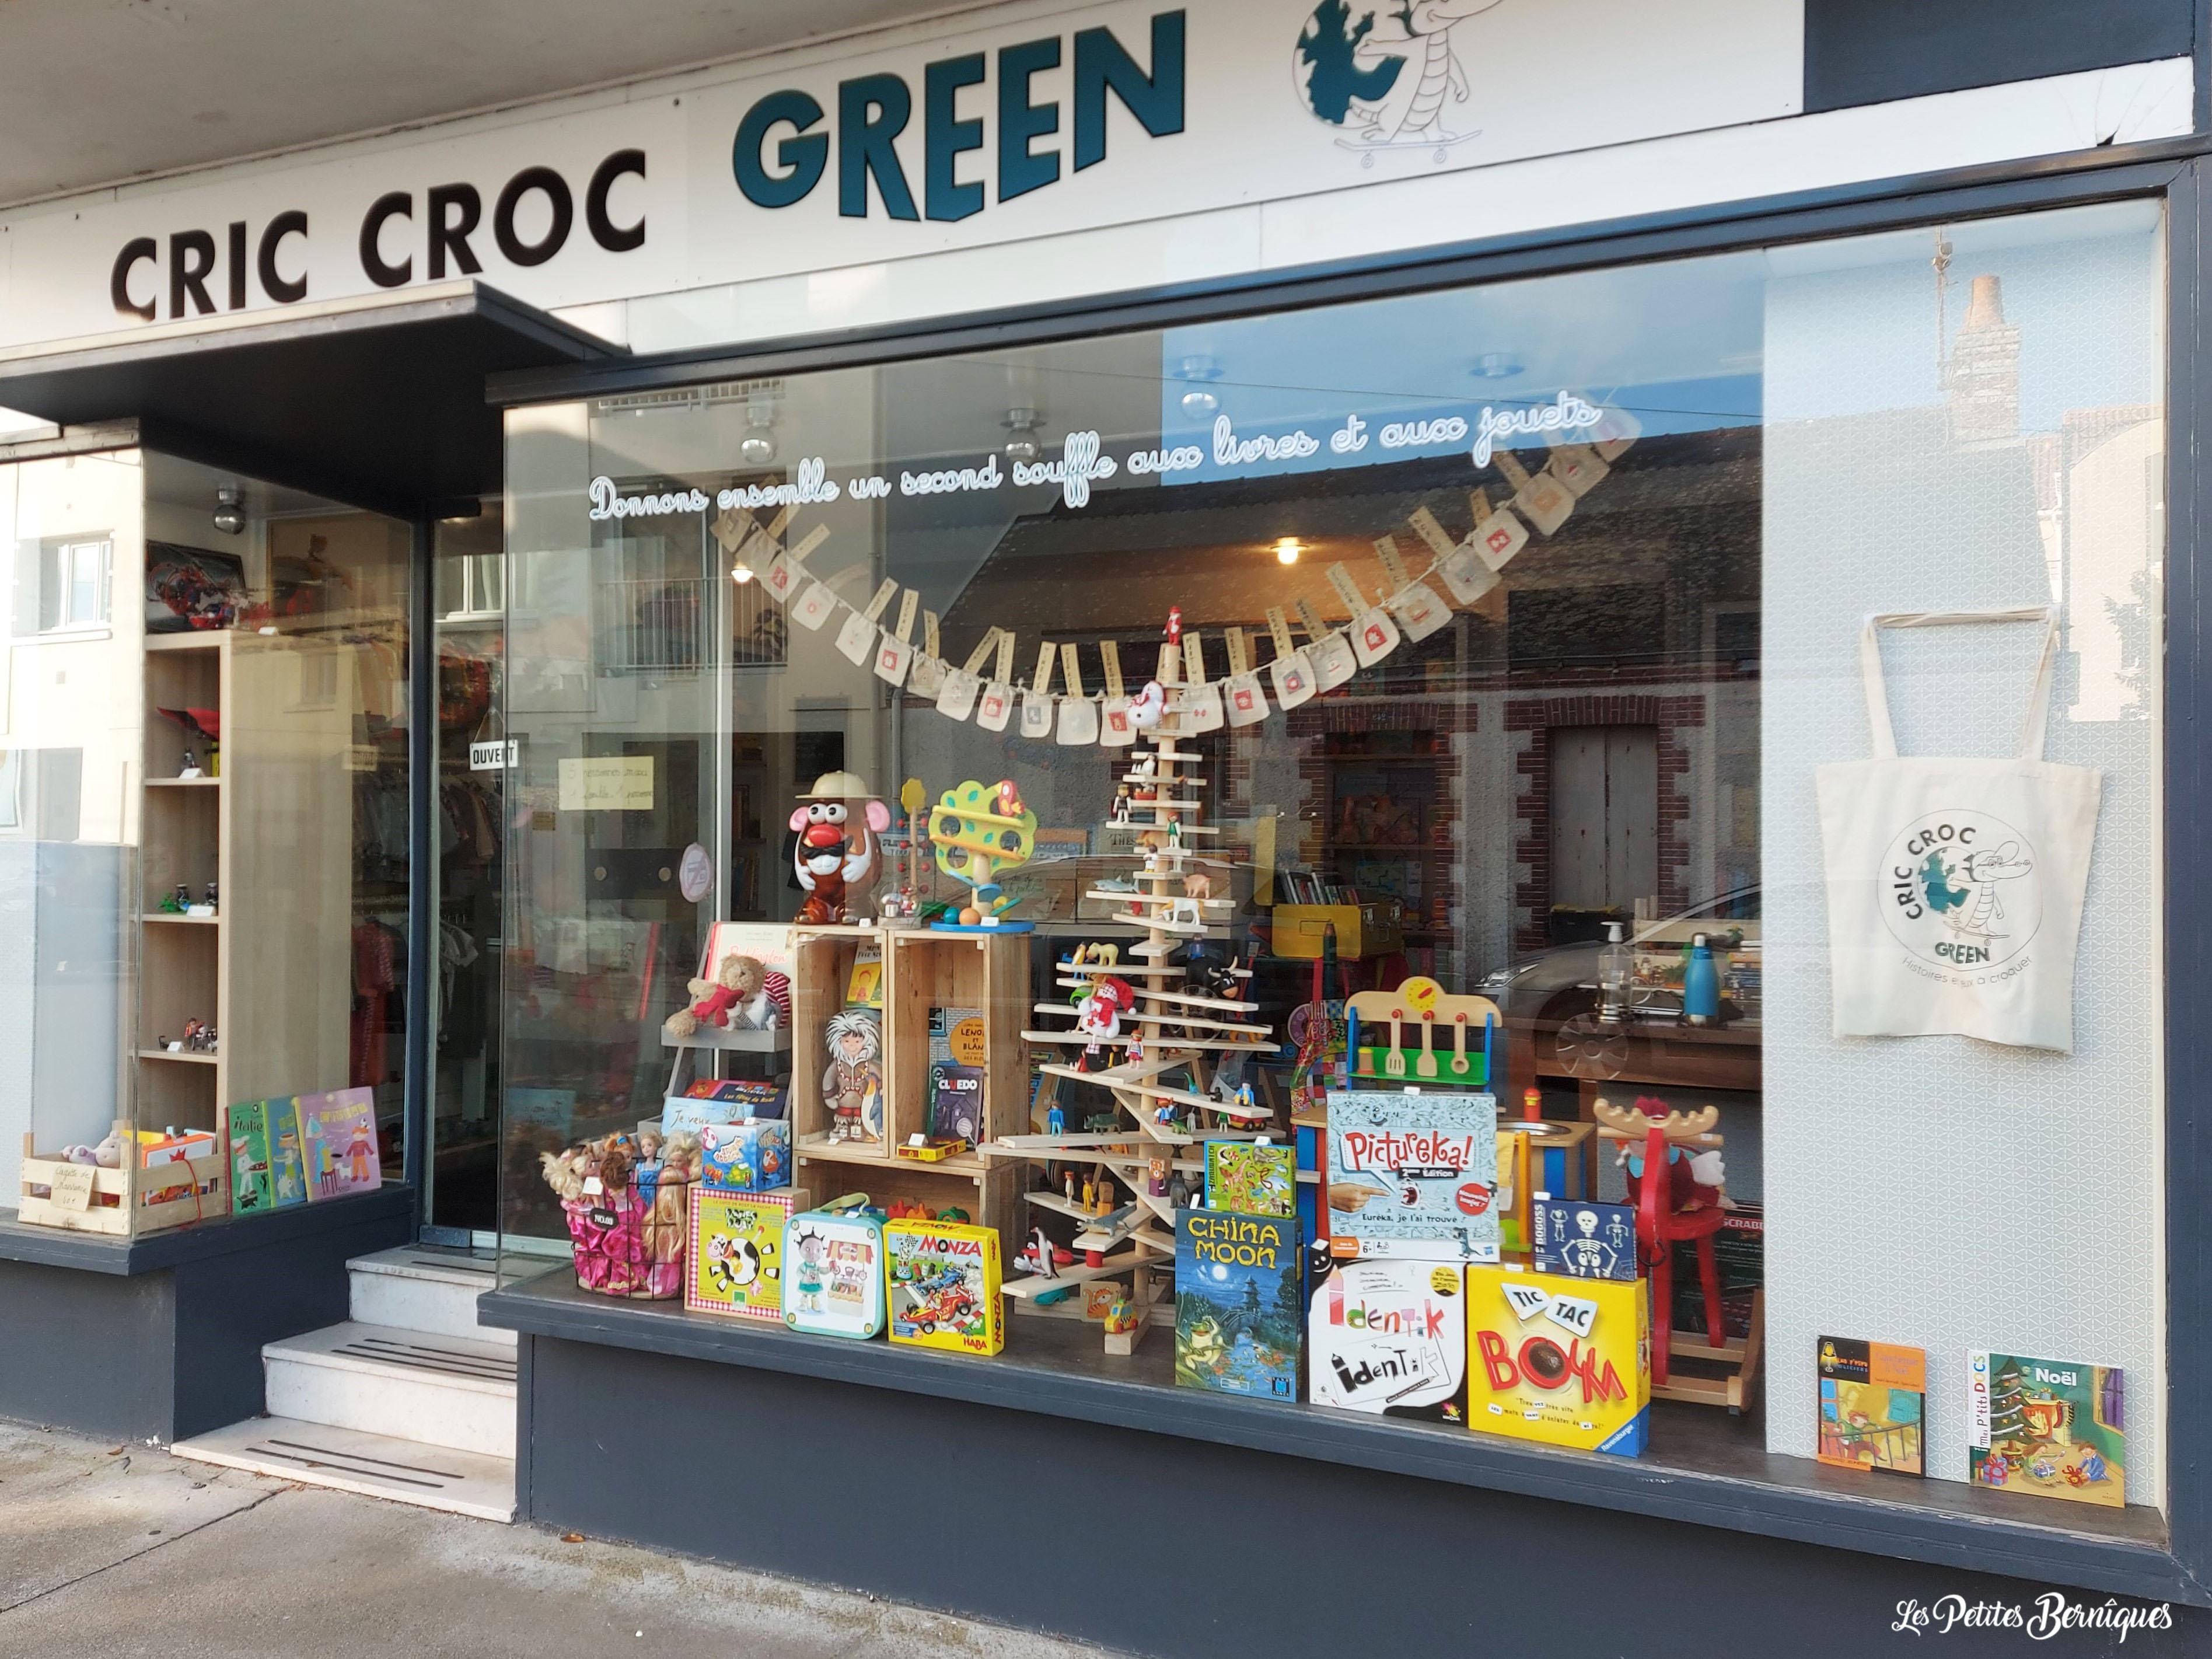 Cric croc green - Boutique Saint-Brevin